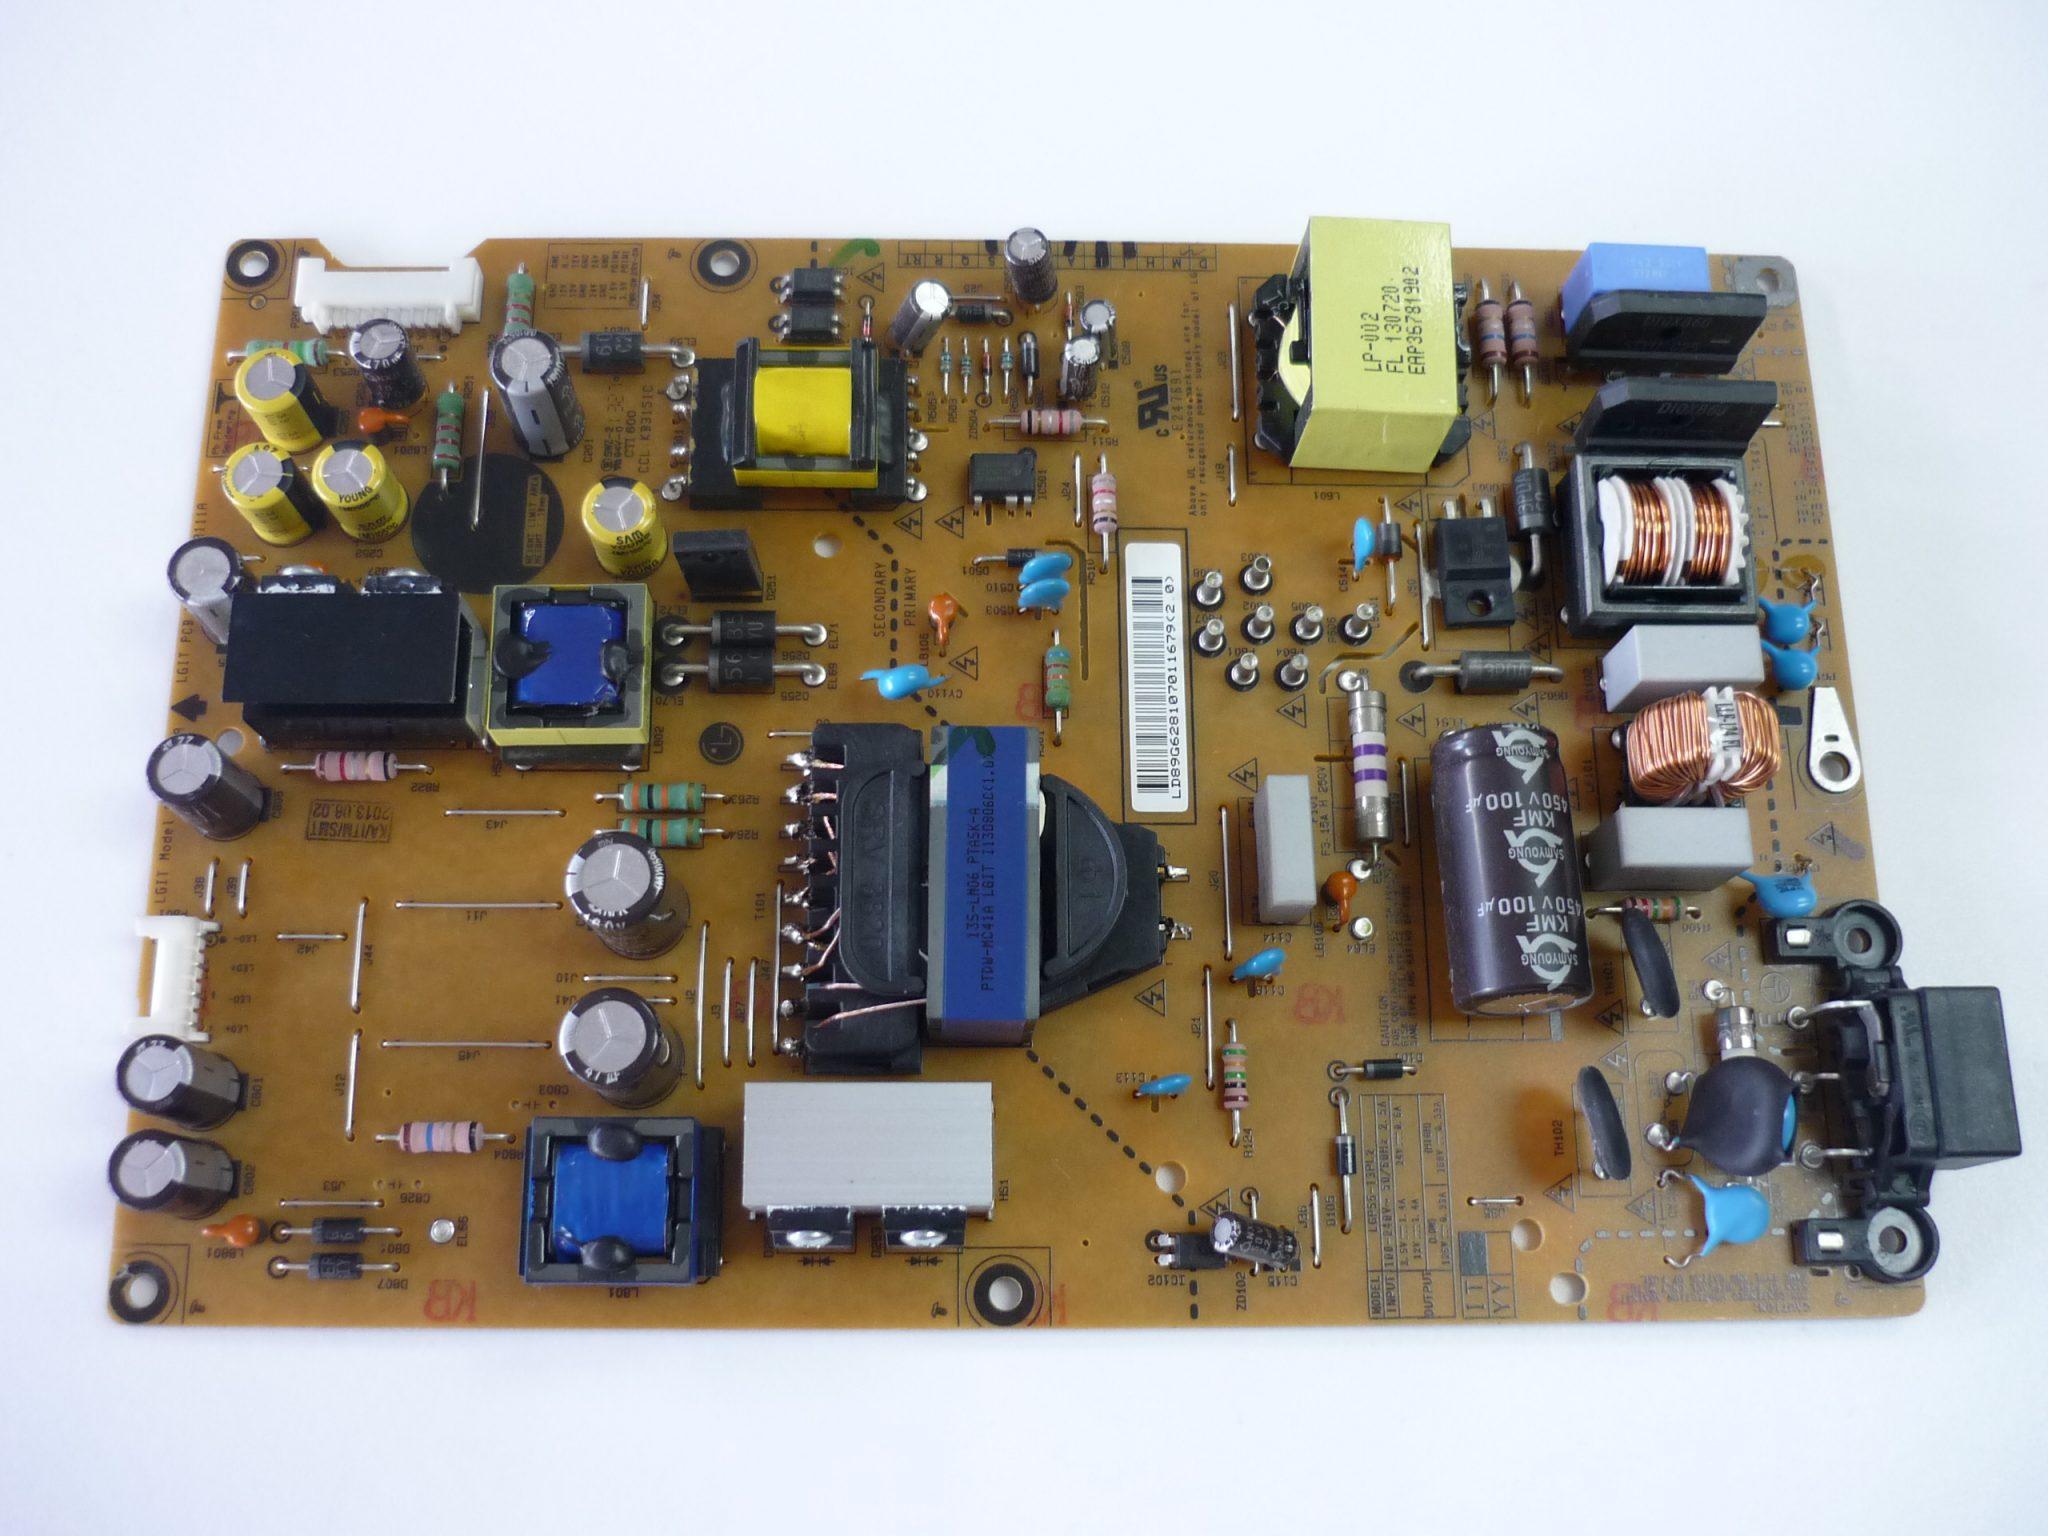 LG EAY62810701 (3PAGC10124A-R) Power Supply / LED Board